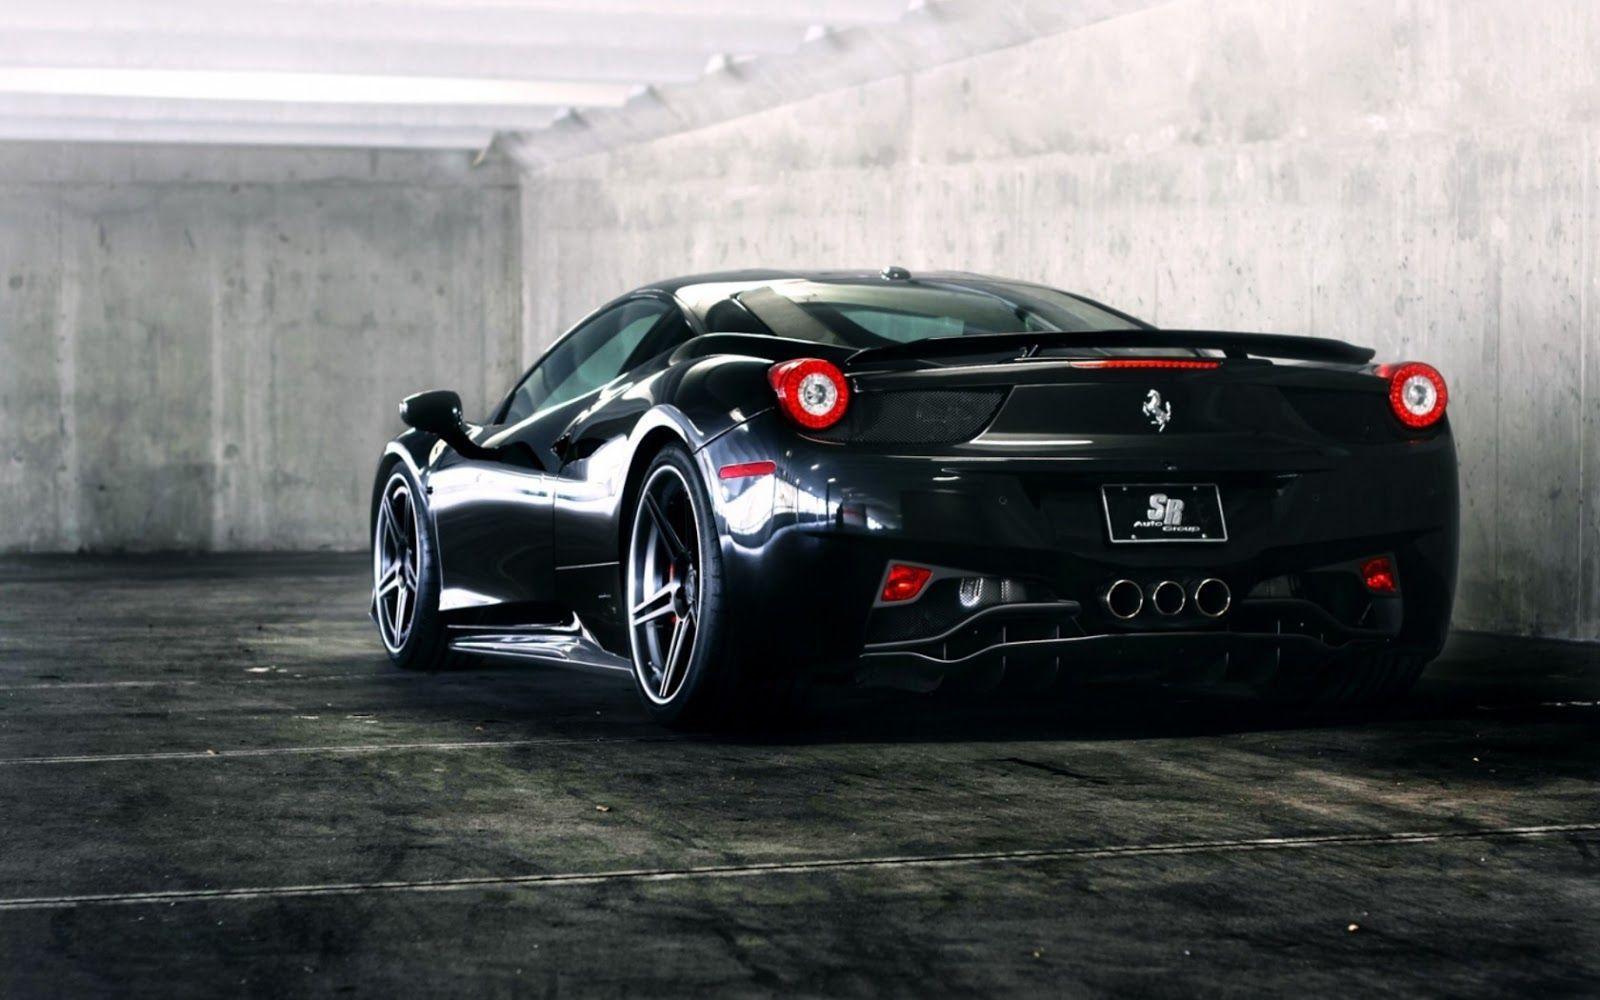 Black Ferrari Wallpaper Hd For Desktop Black Ferrari Hd Desktop